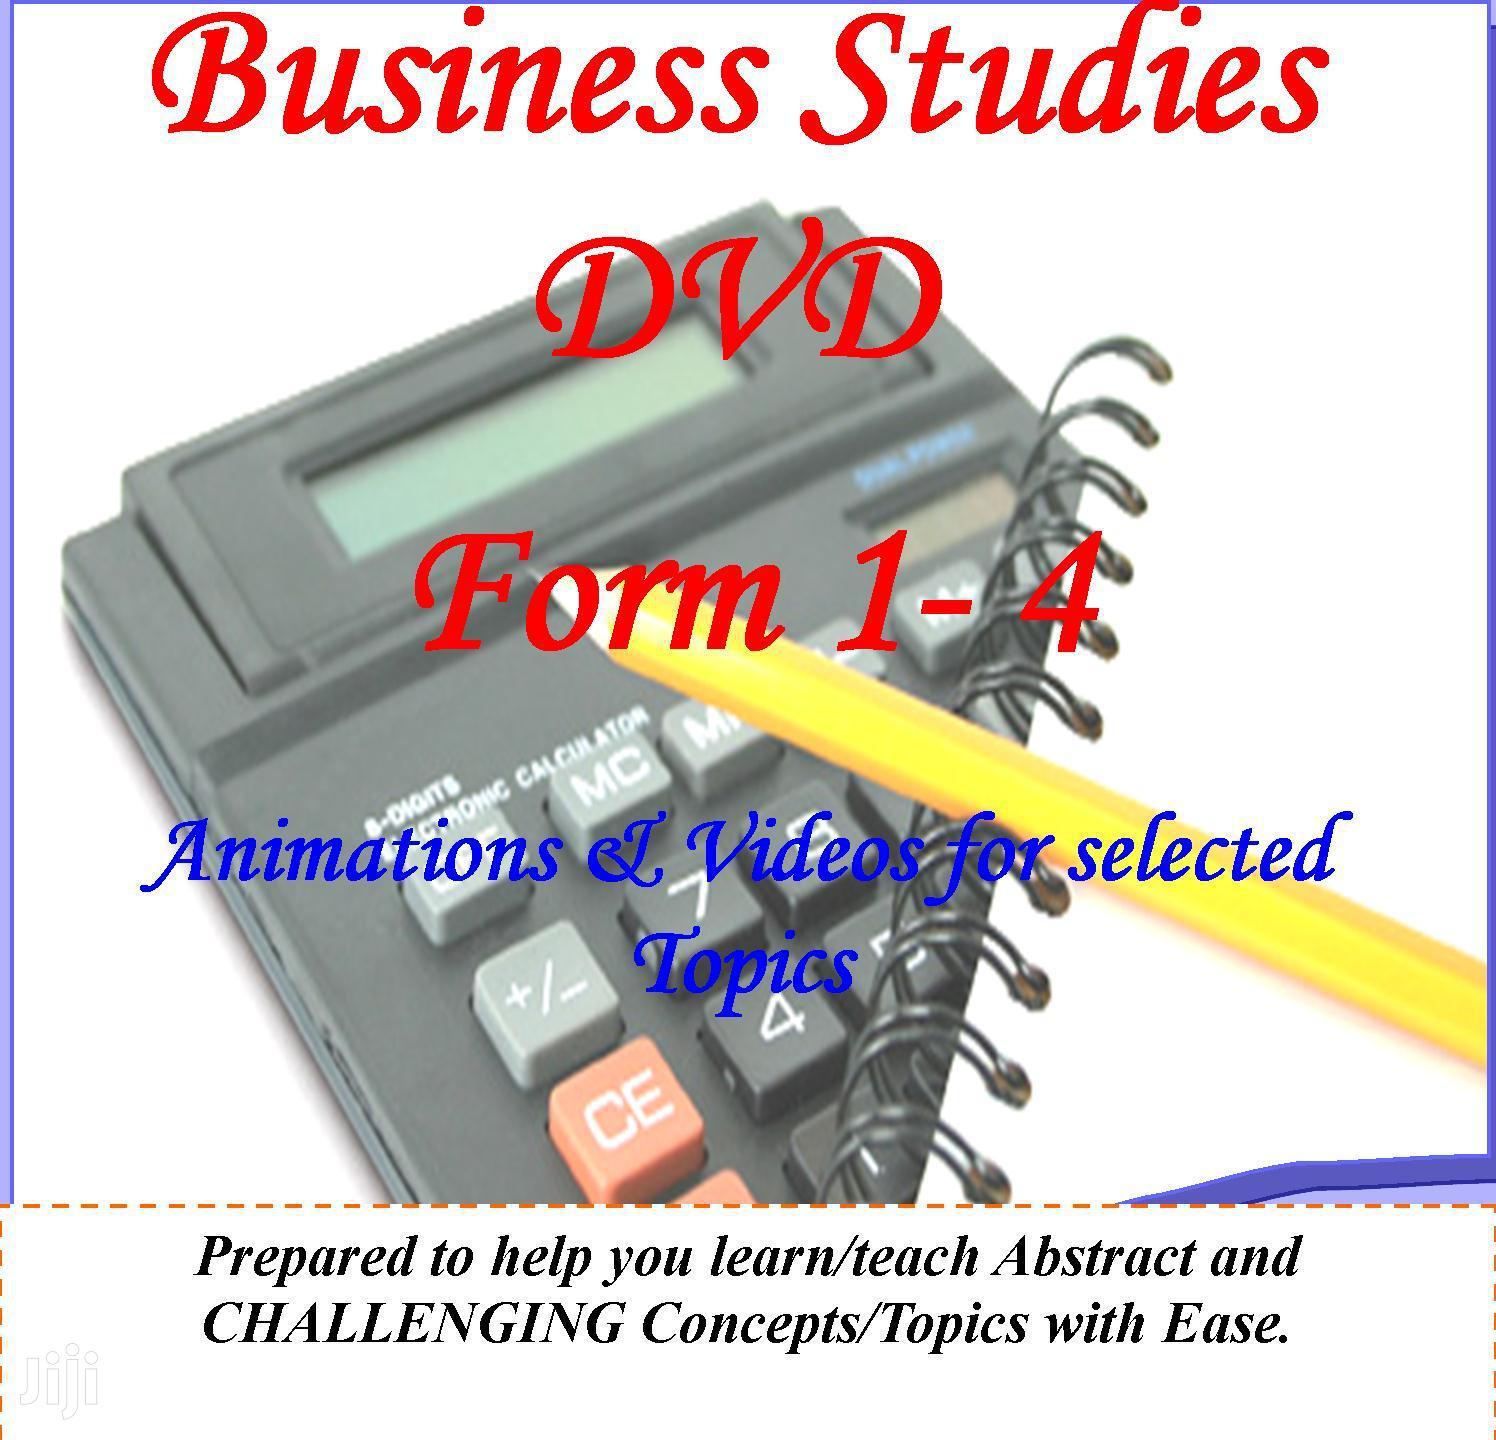 Archive: Business Studies Dvd